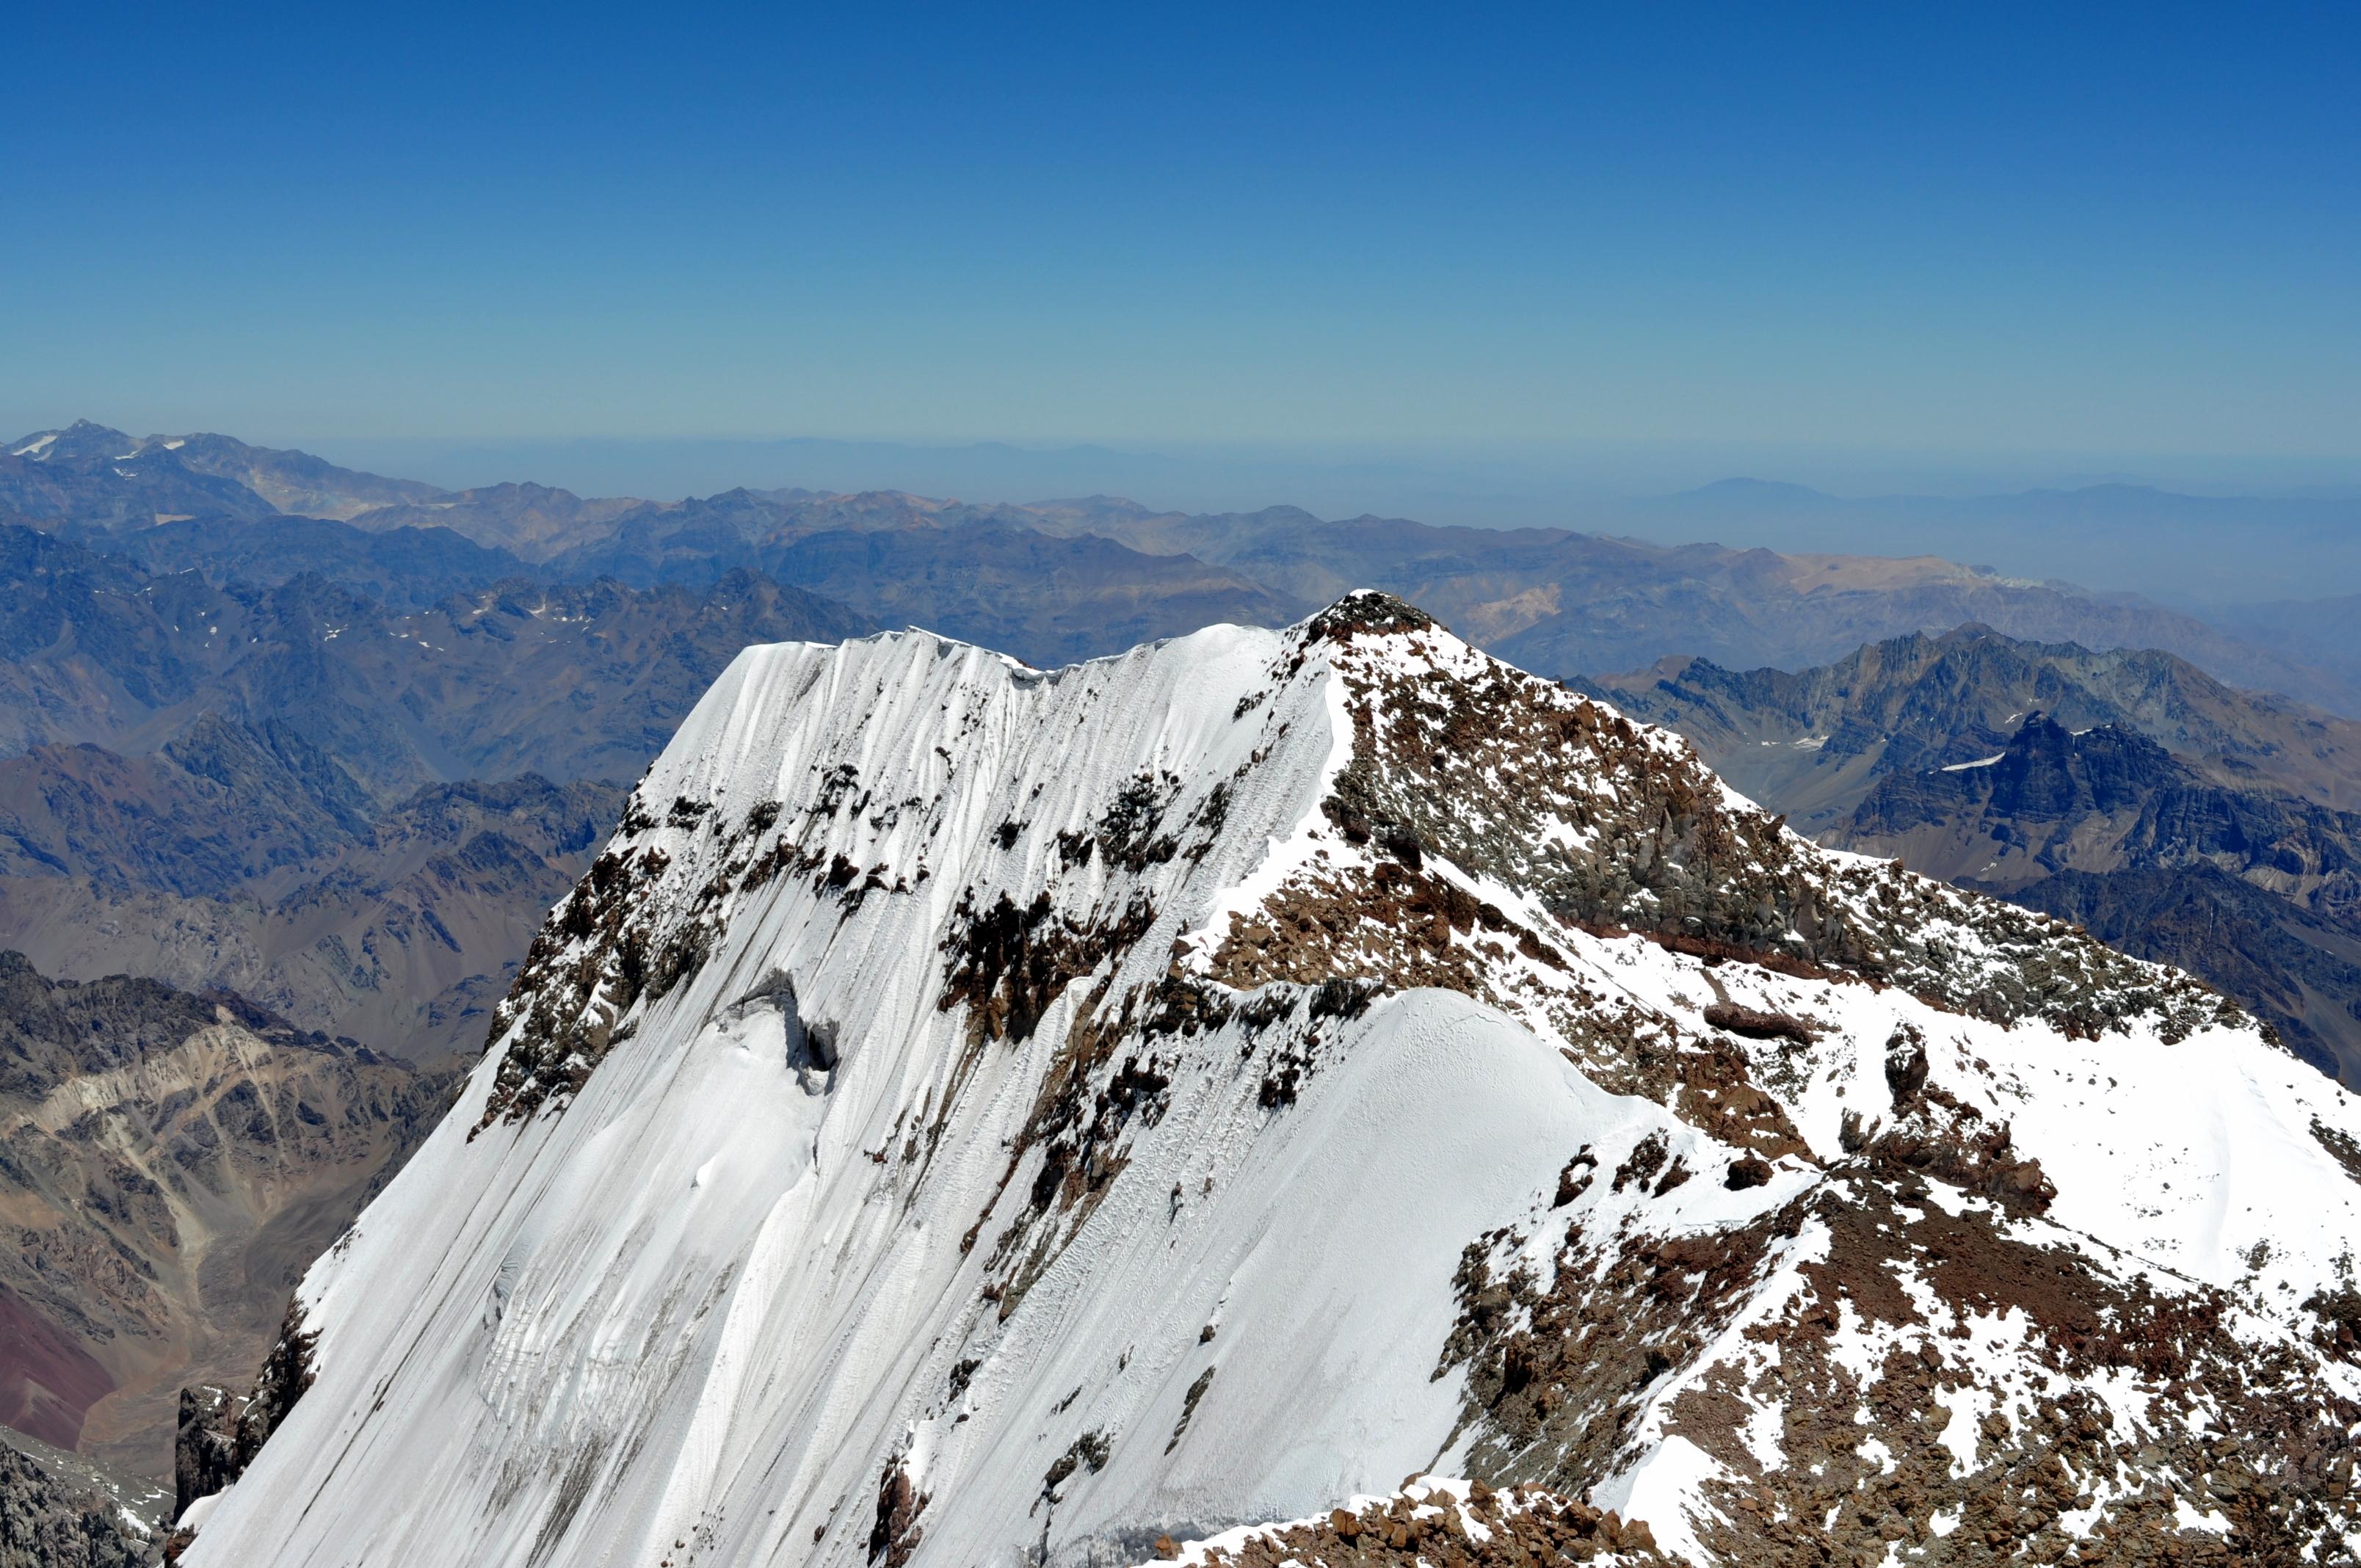 Mount Aconcagua (6,962 mts / 22,841 ft)